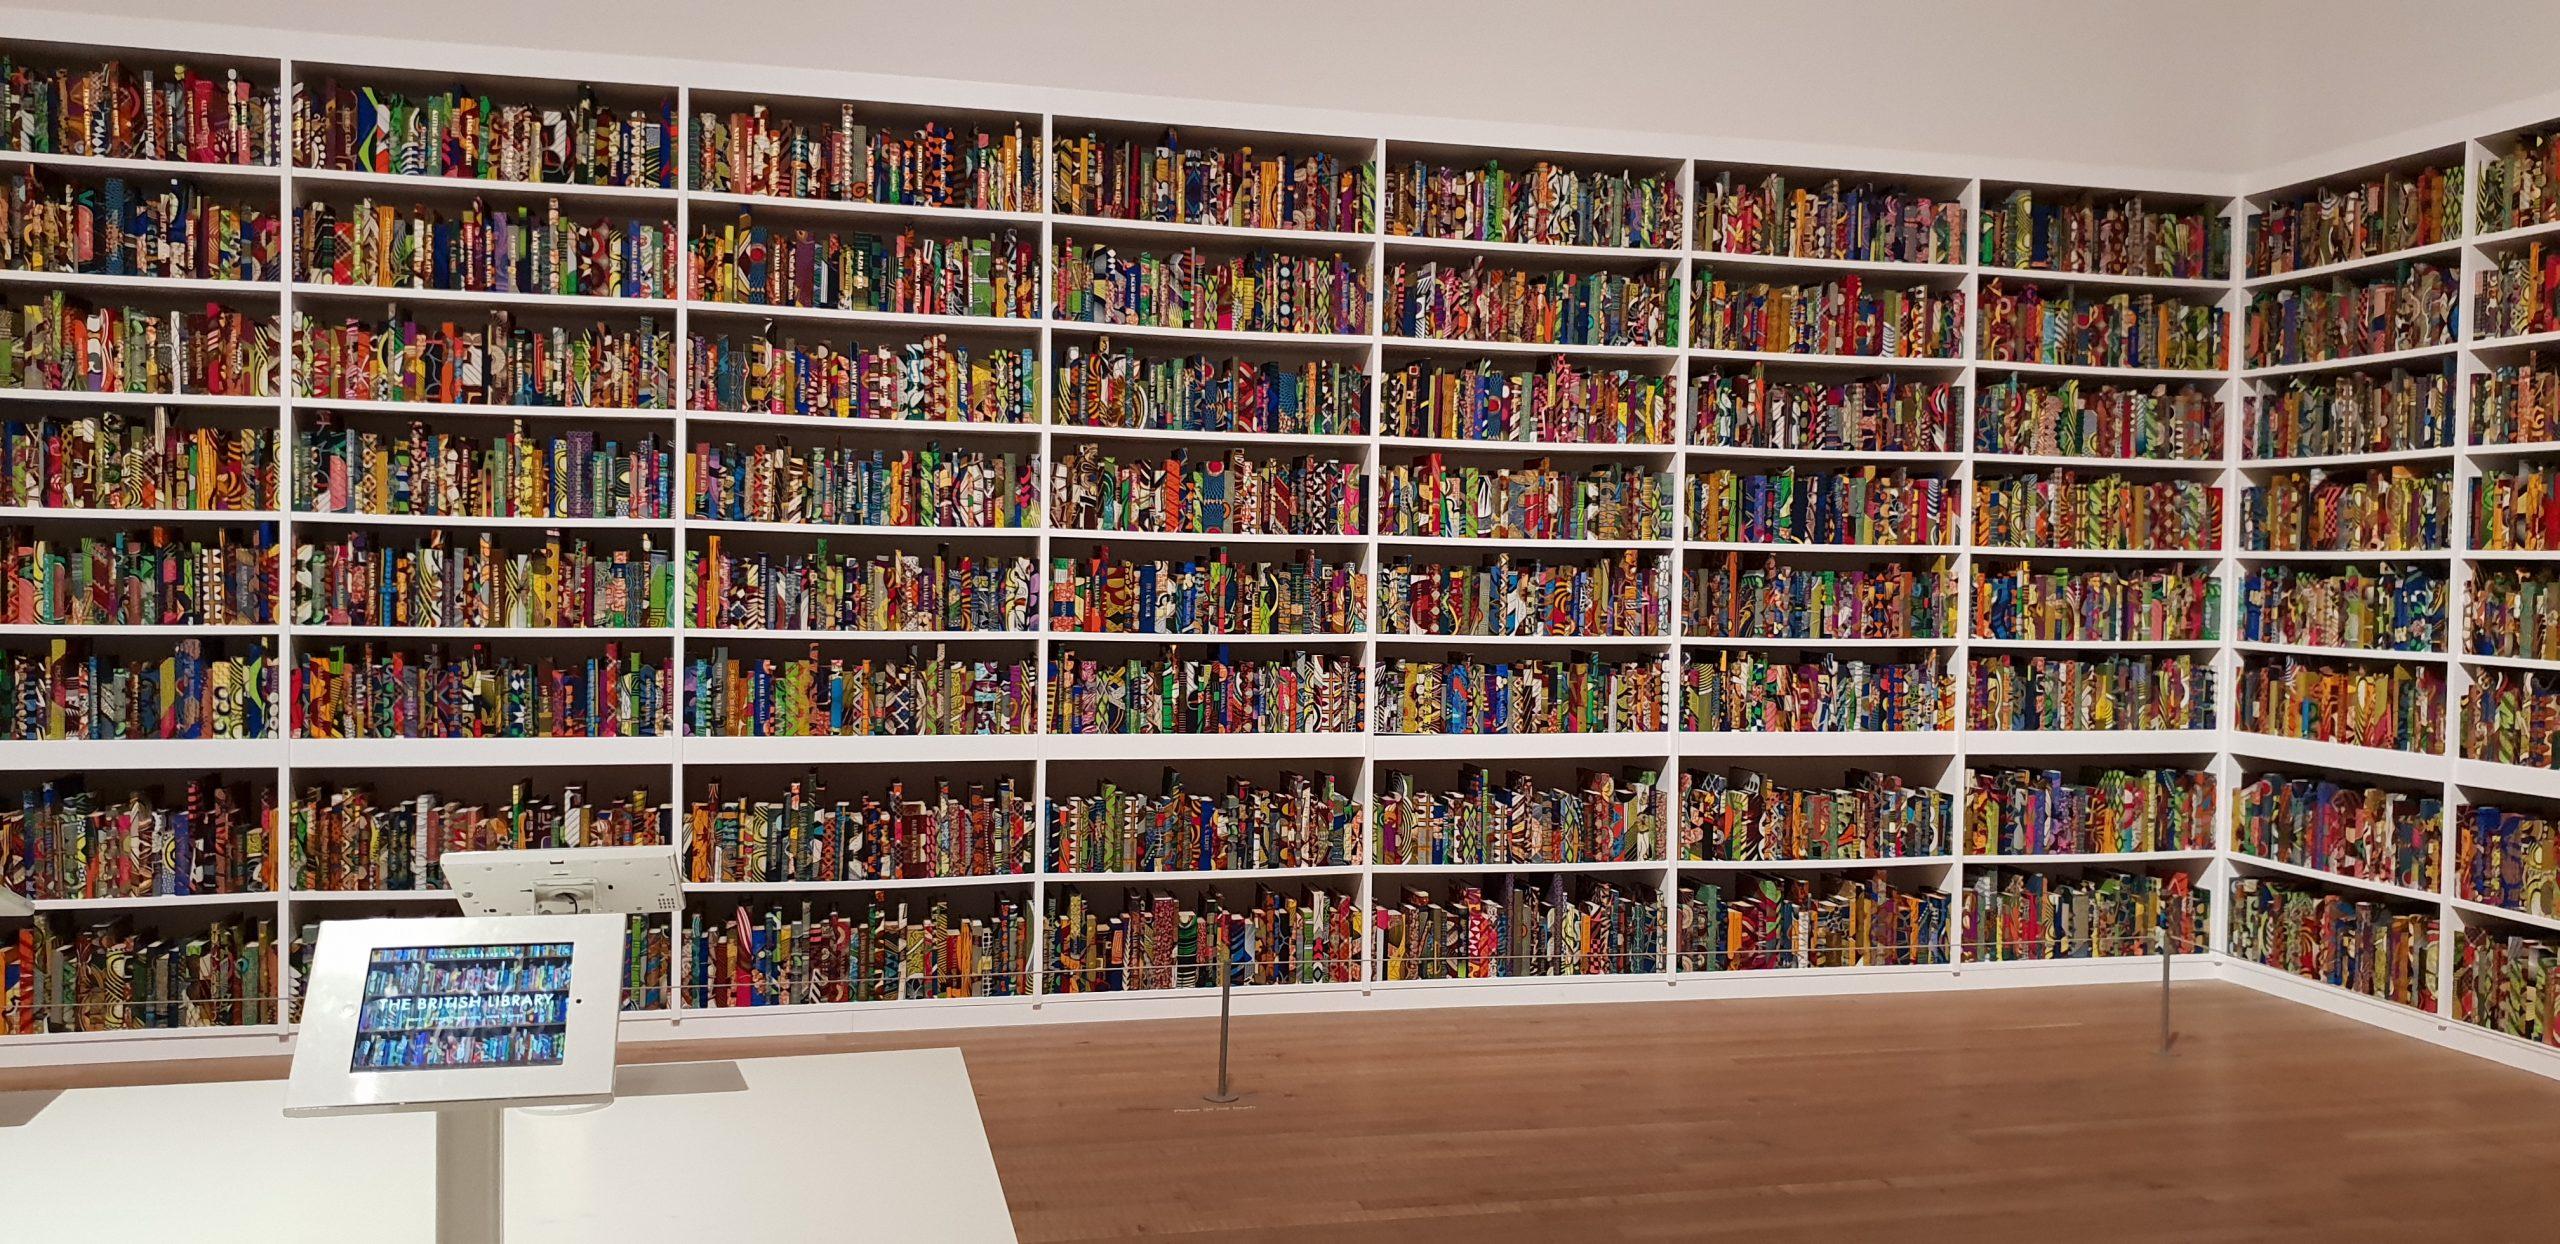 A replica of a library in Tate Modern